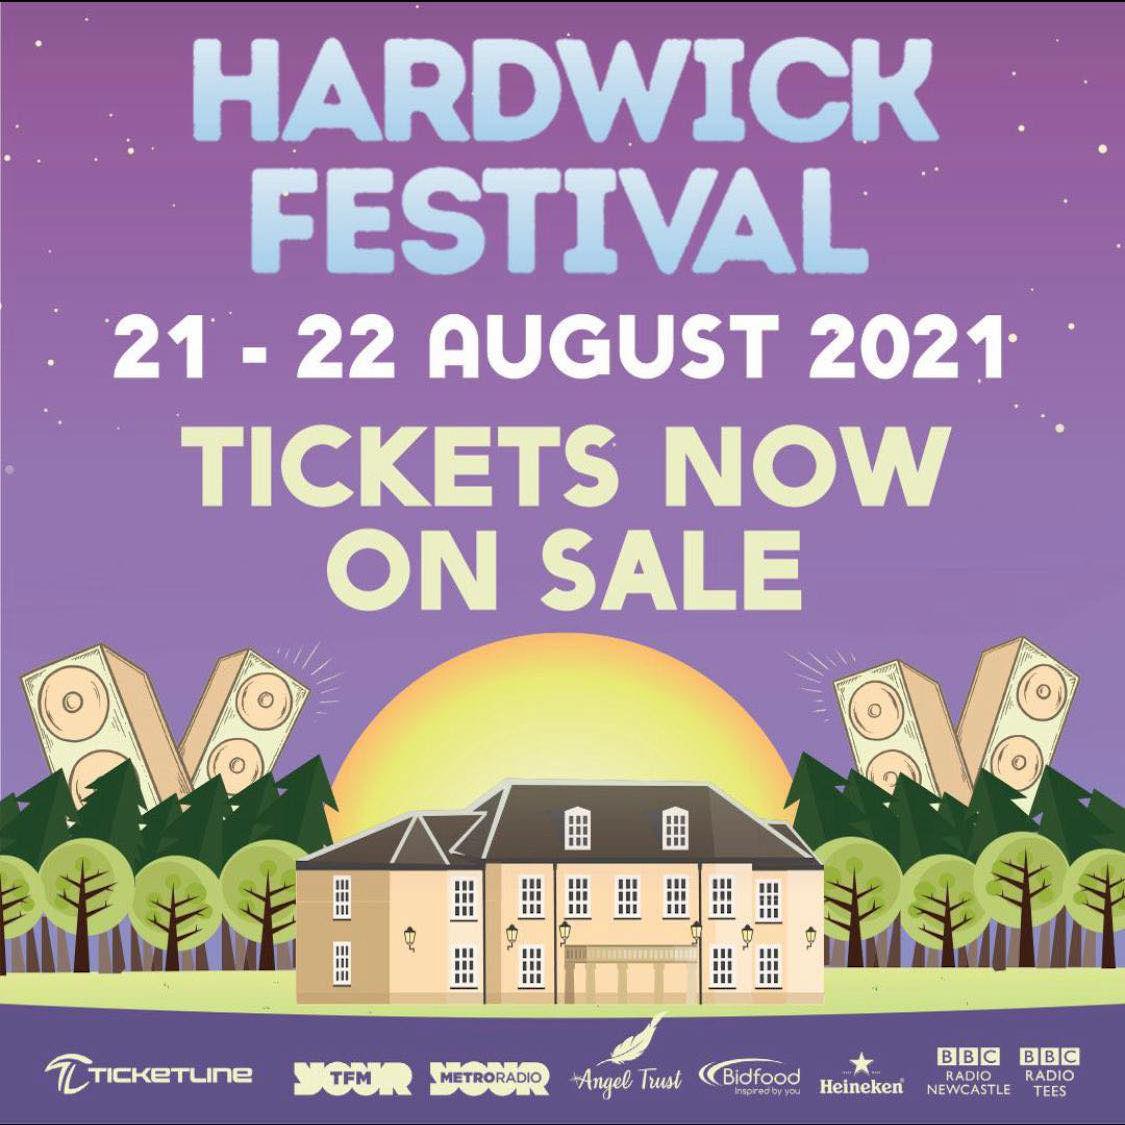 Hardwick Festival 2021 - Saturday